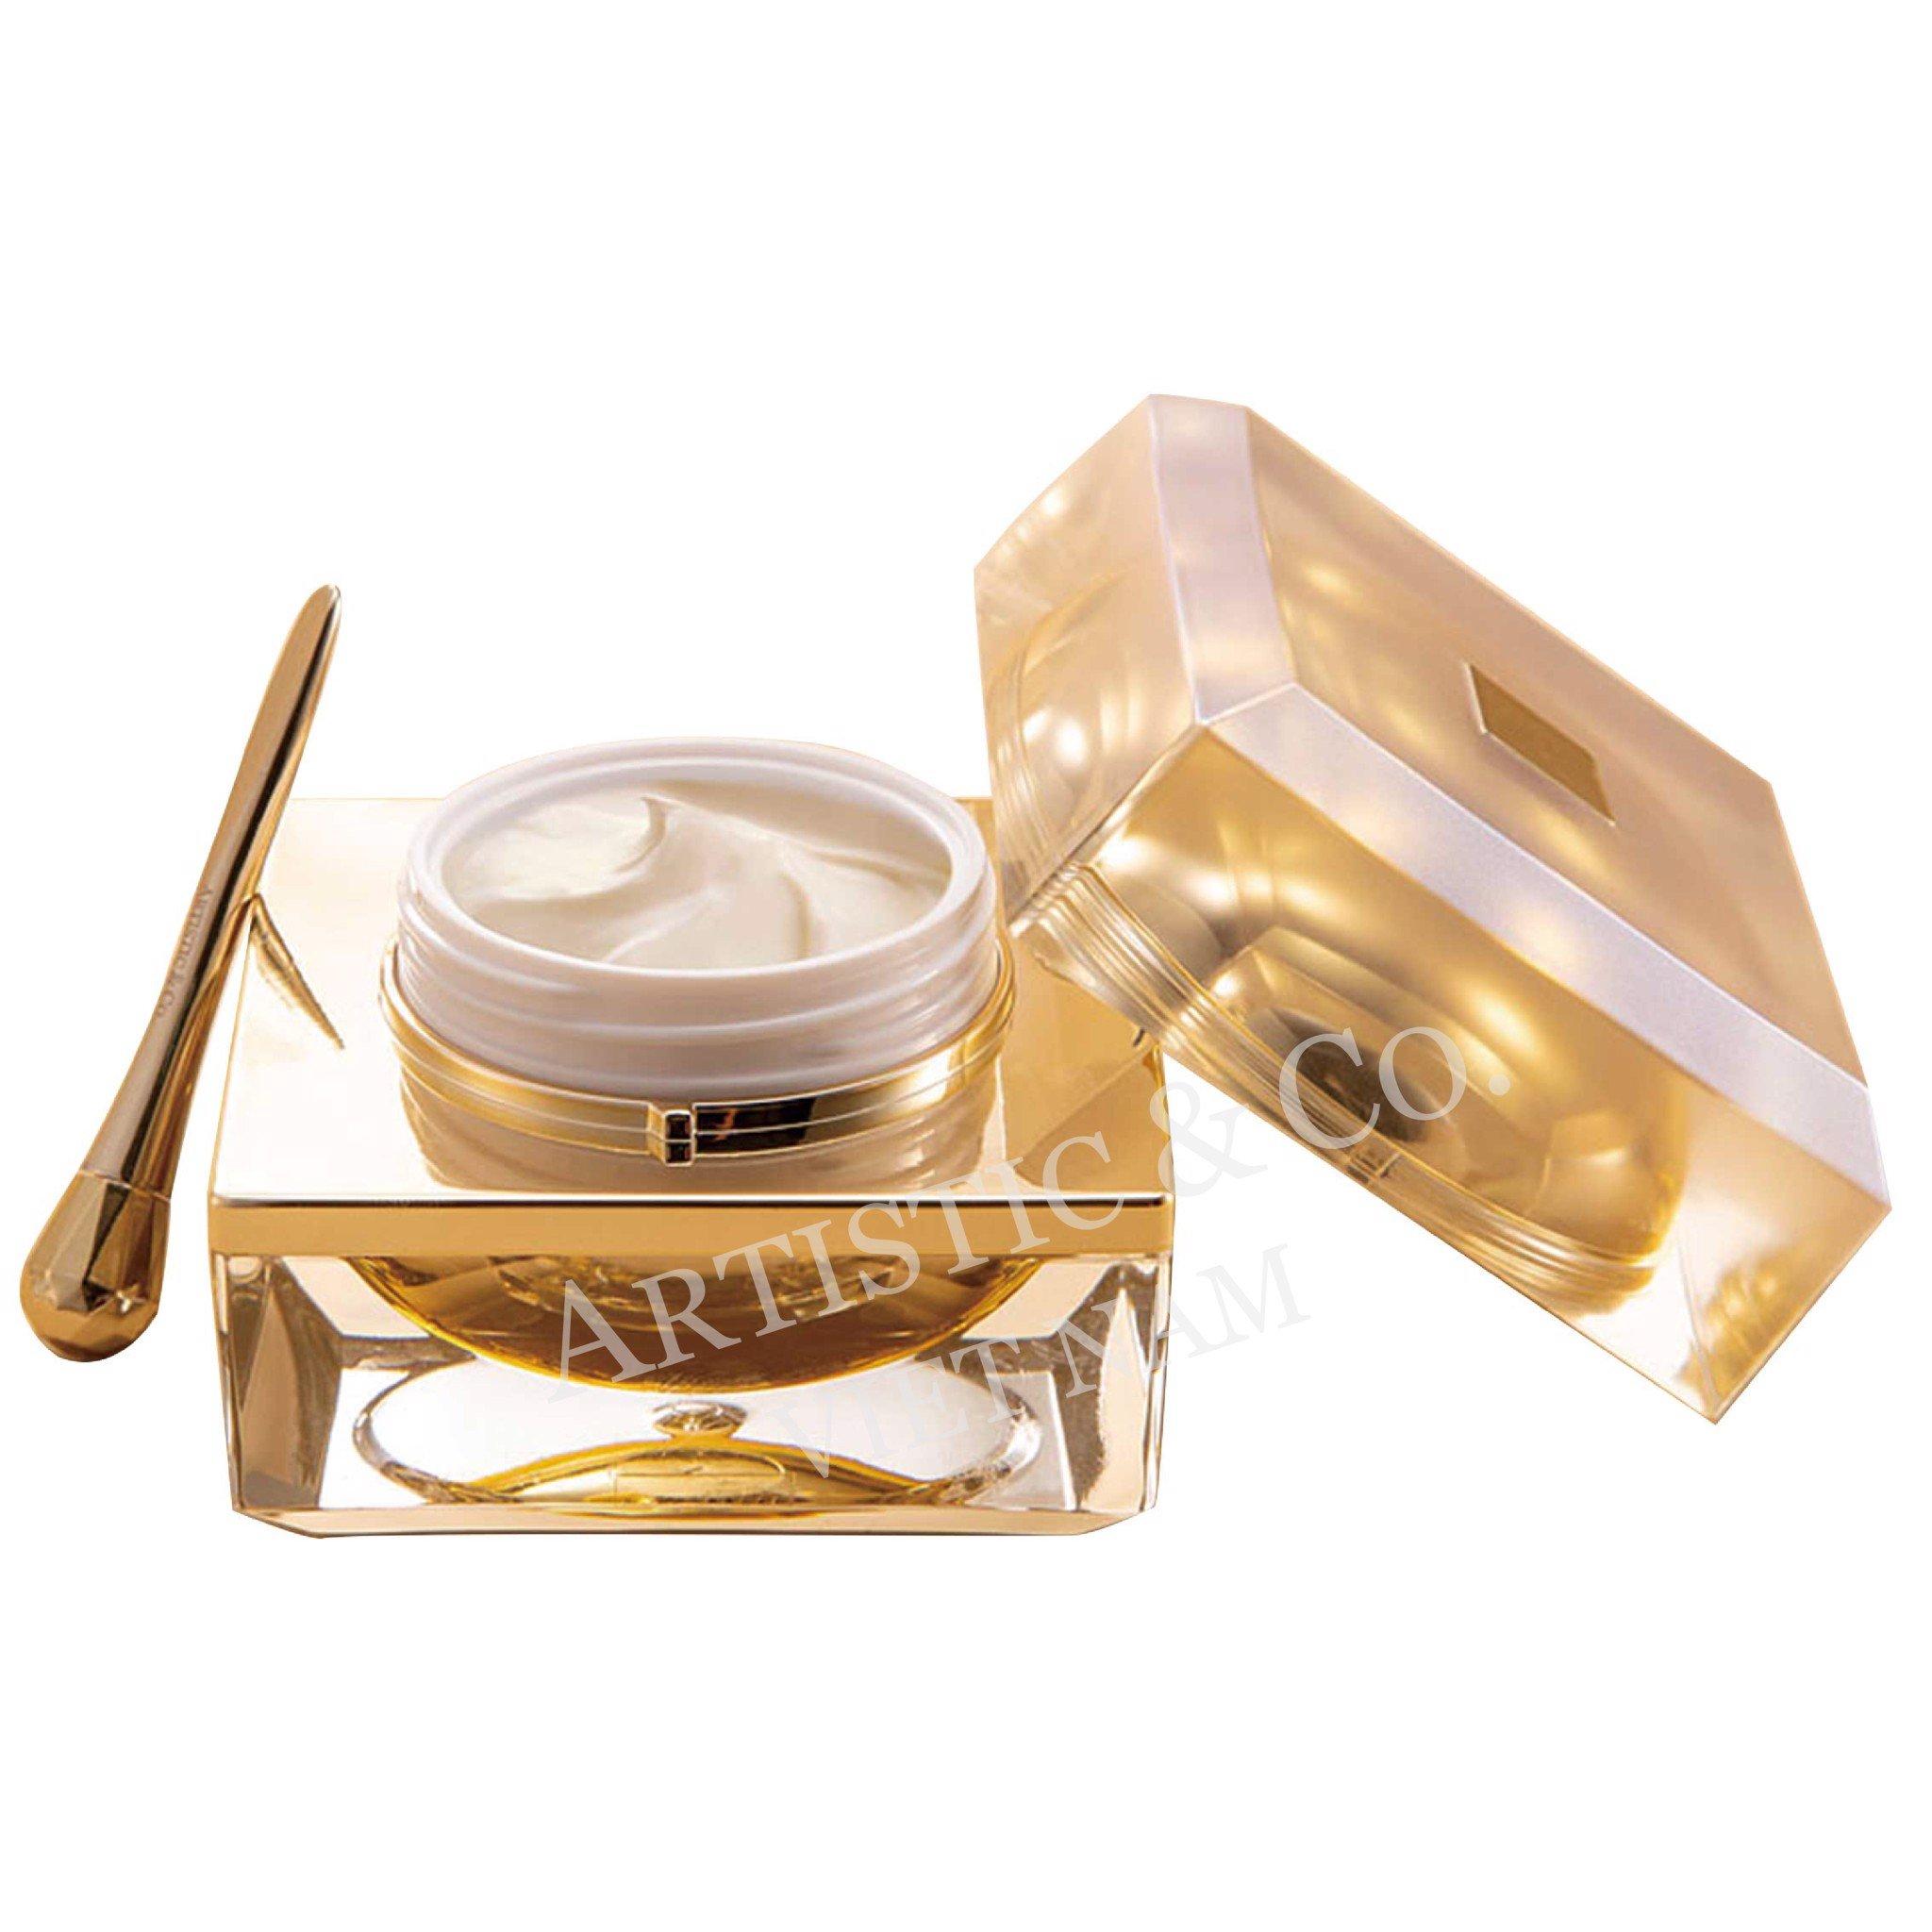 P.E Golden Beauty The Cream 50g